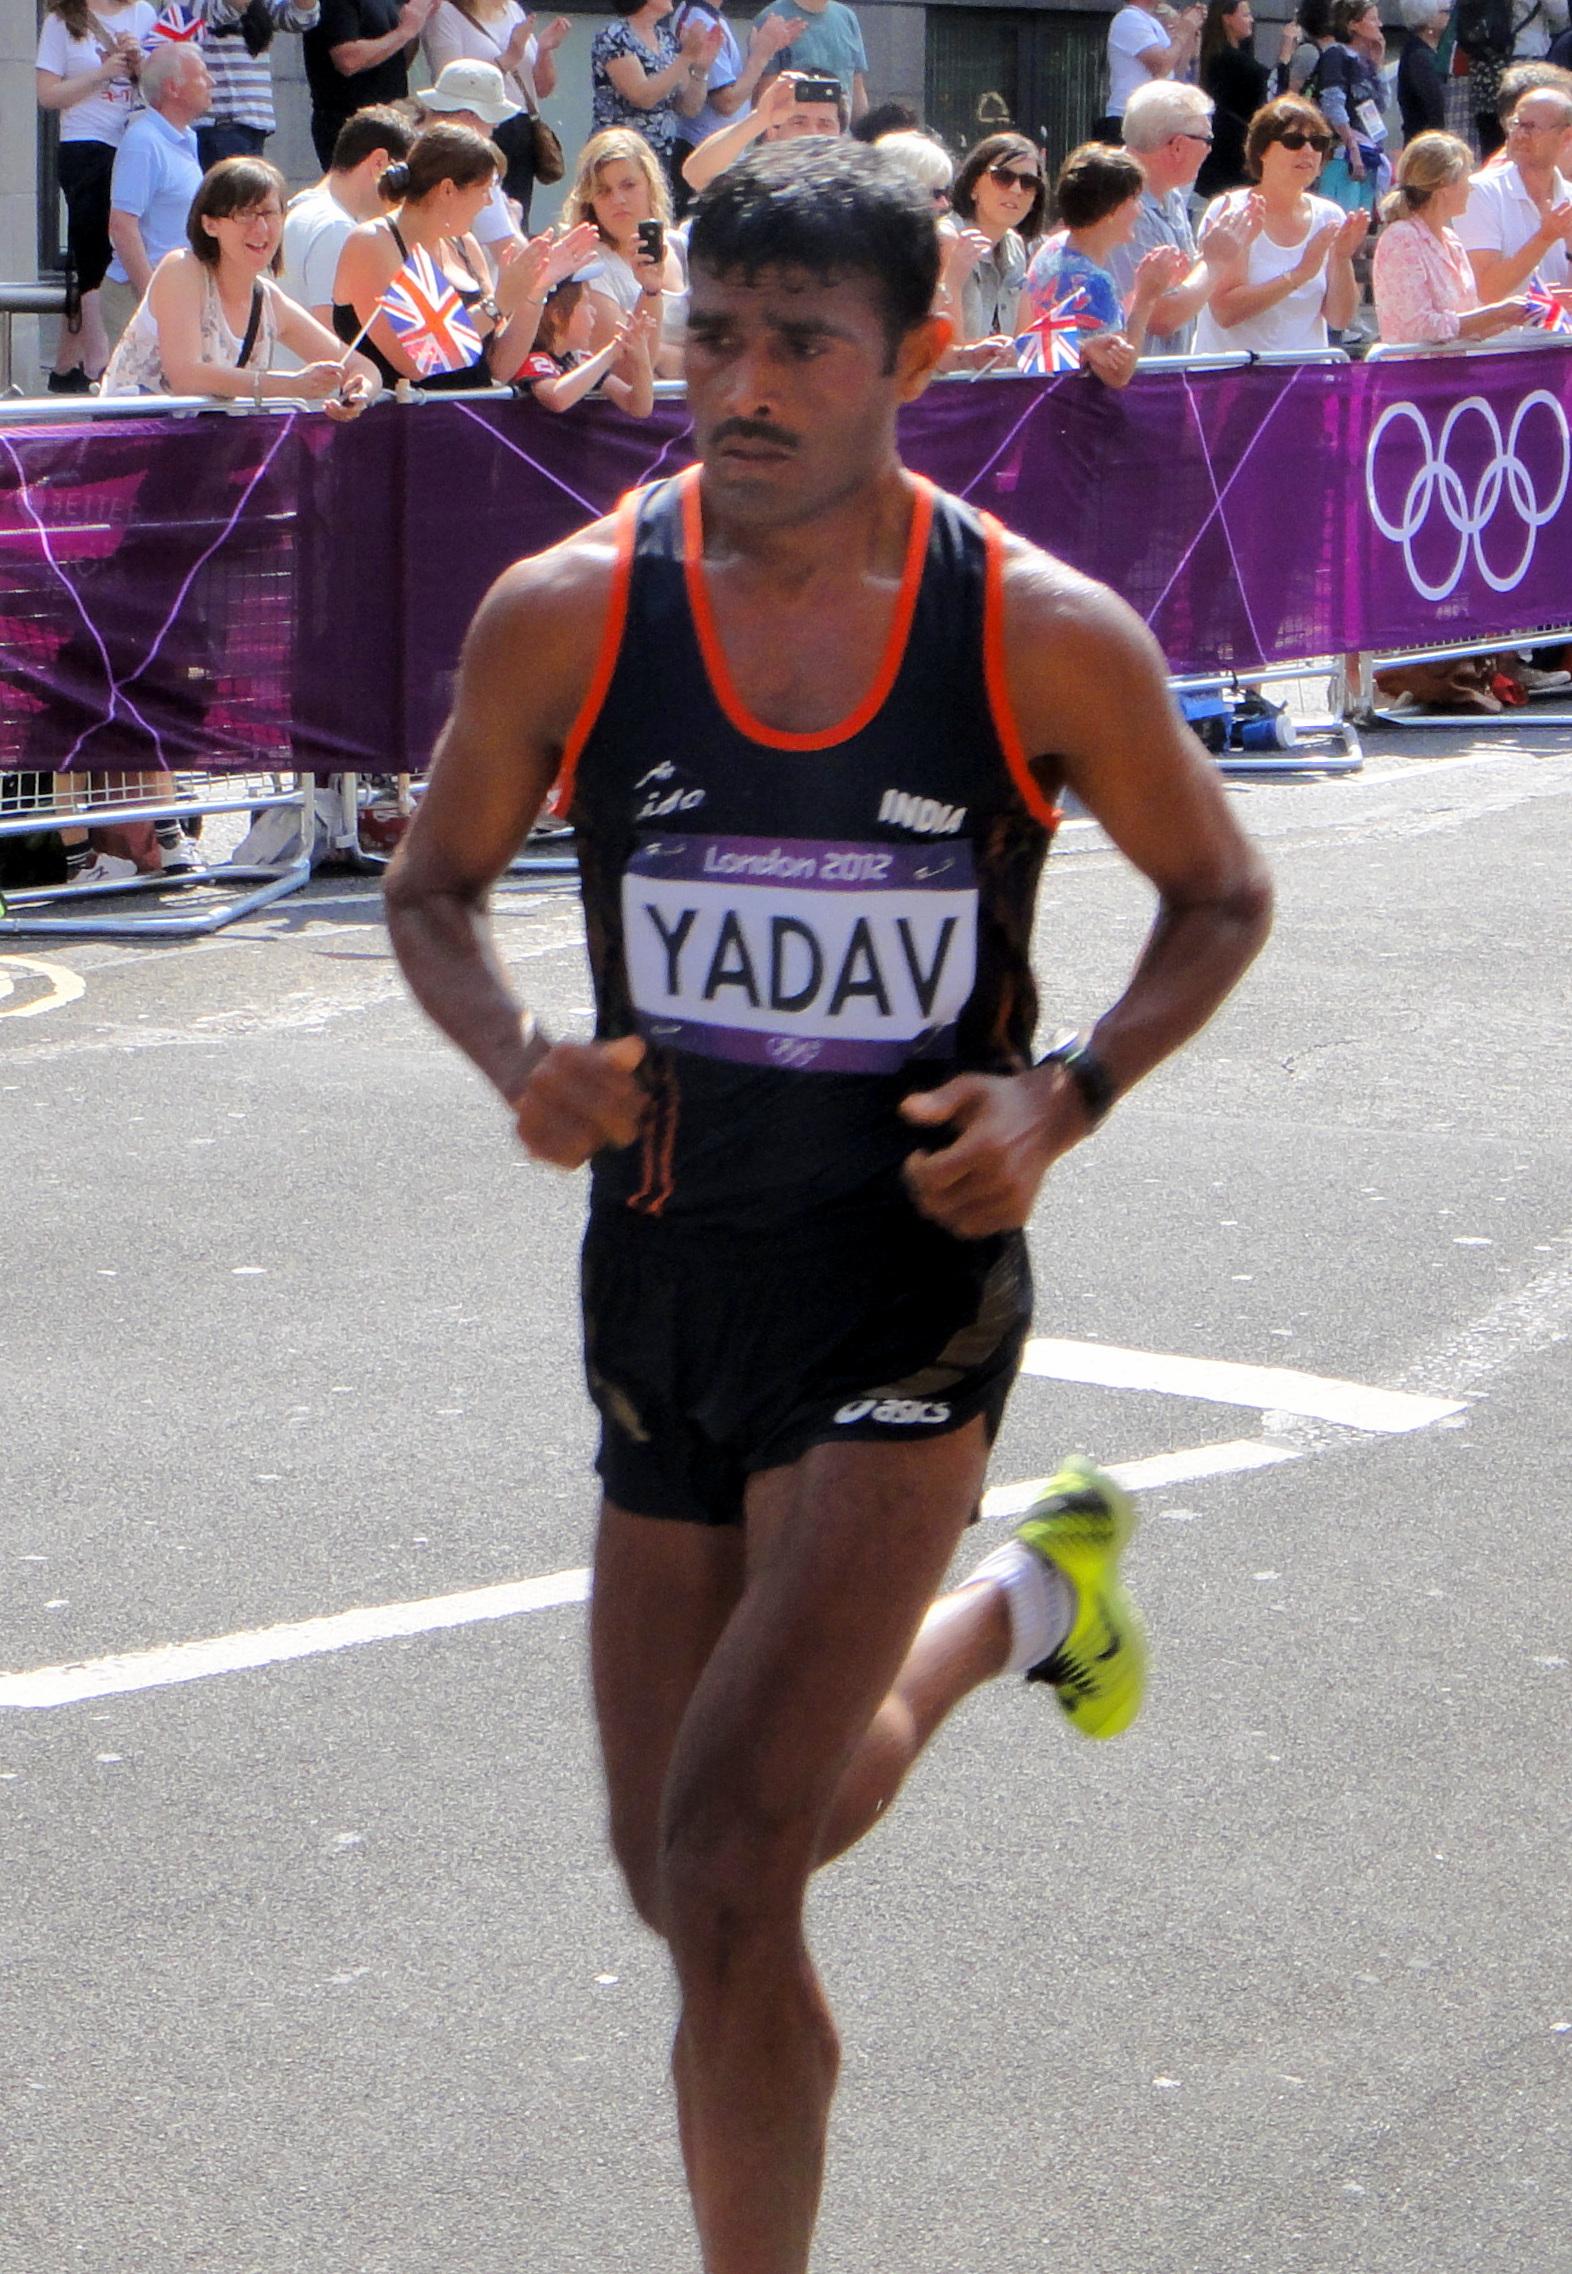 Ram Singh Yadav - Wikipedia